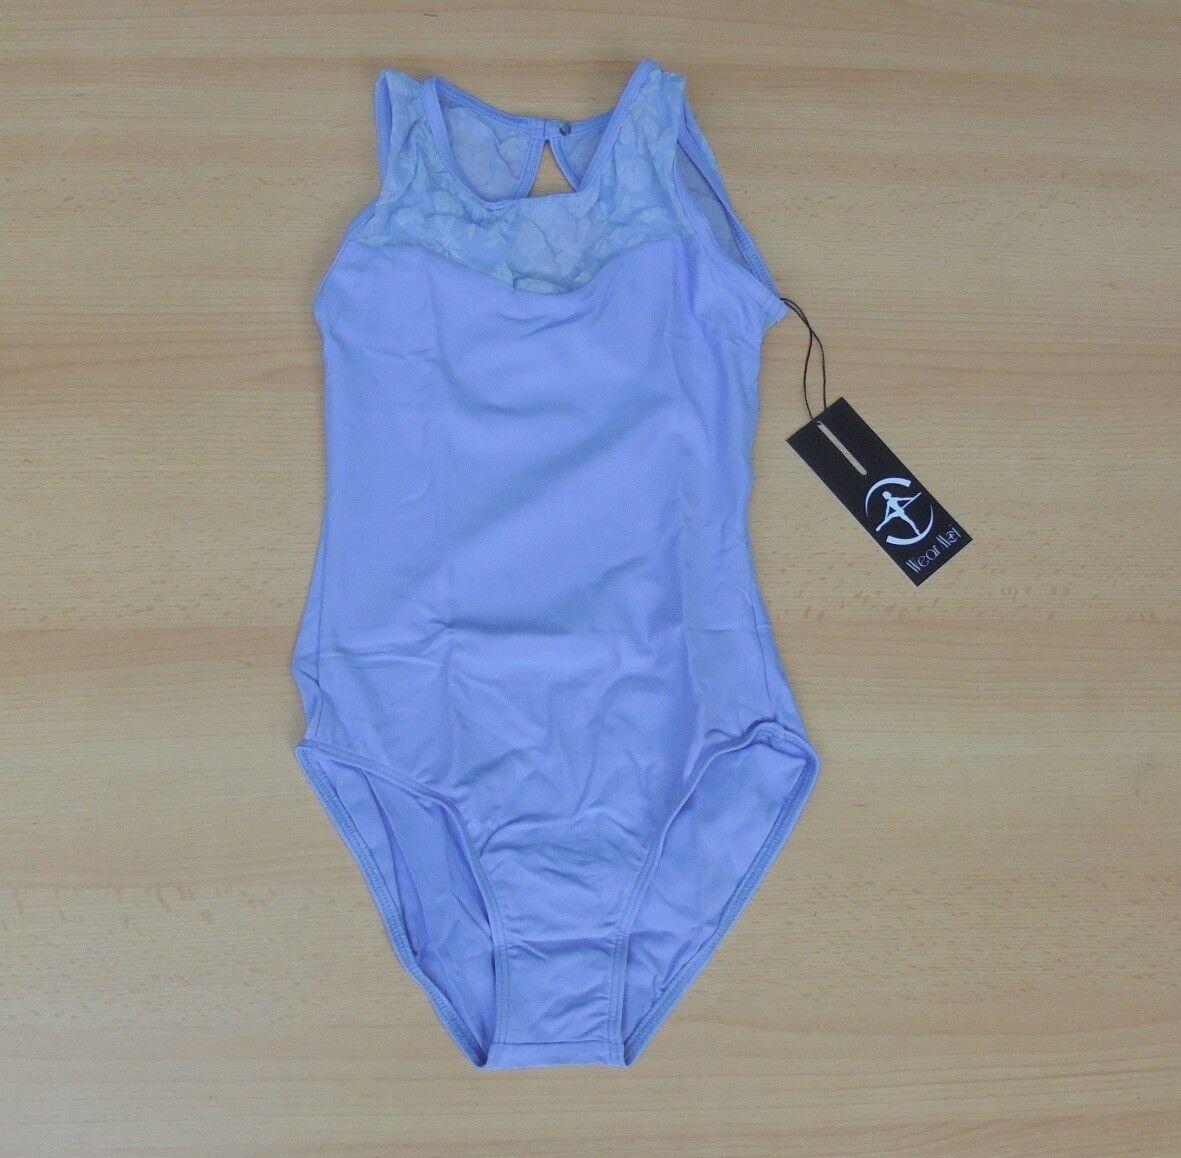 Wear Moi Majeste 10 12 Obertrikot Tanztrikot Tanztrikot Tanztrikot Body Ballett Camisole Lilac Flieder 081f0c